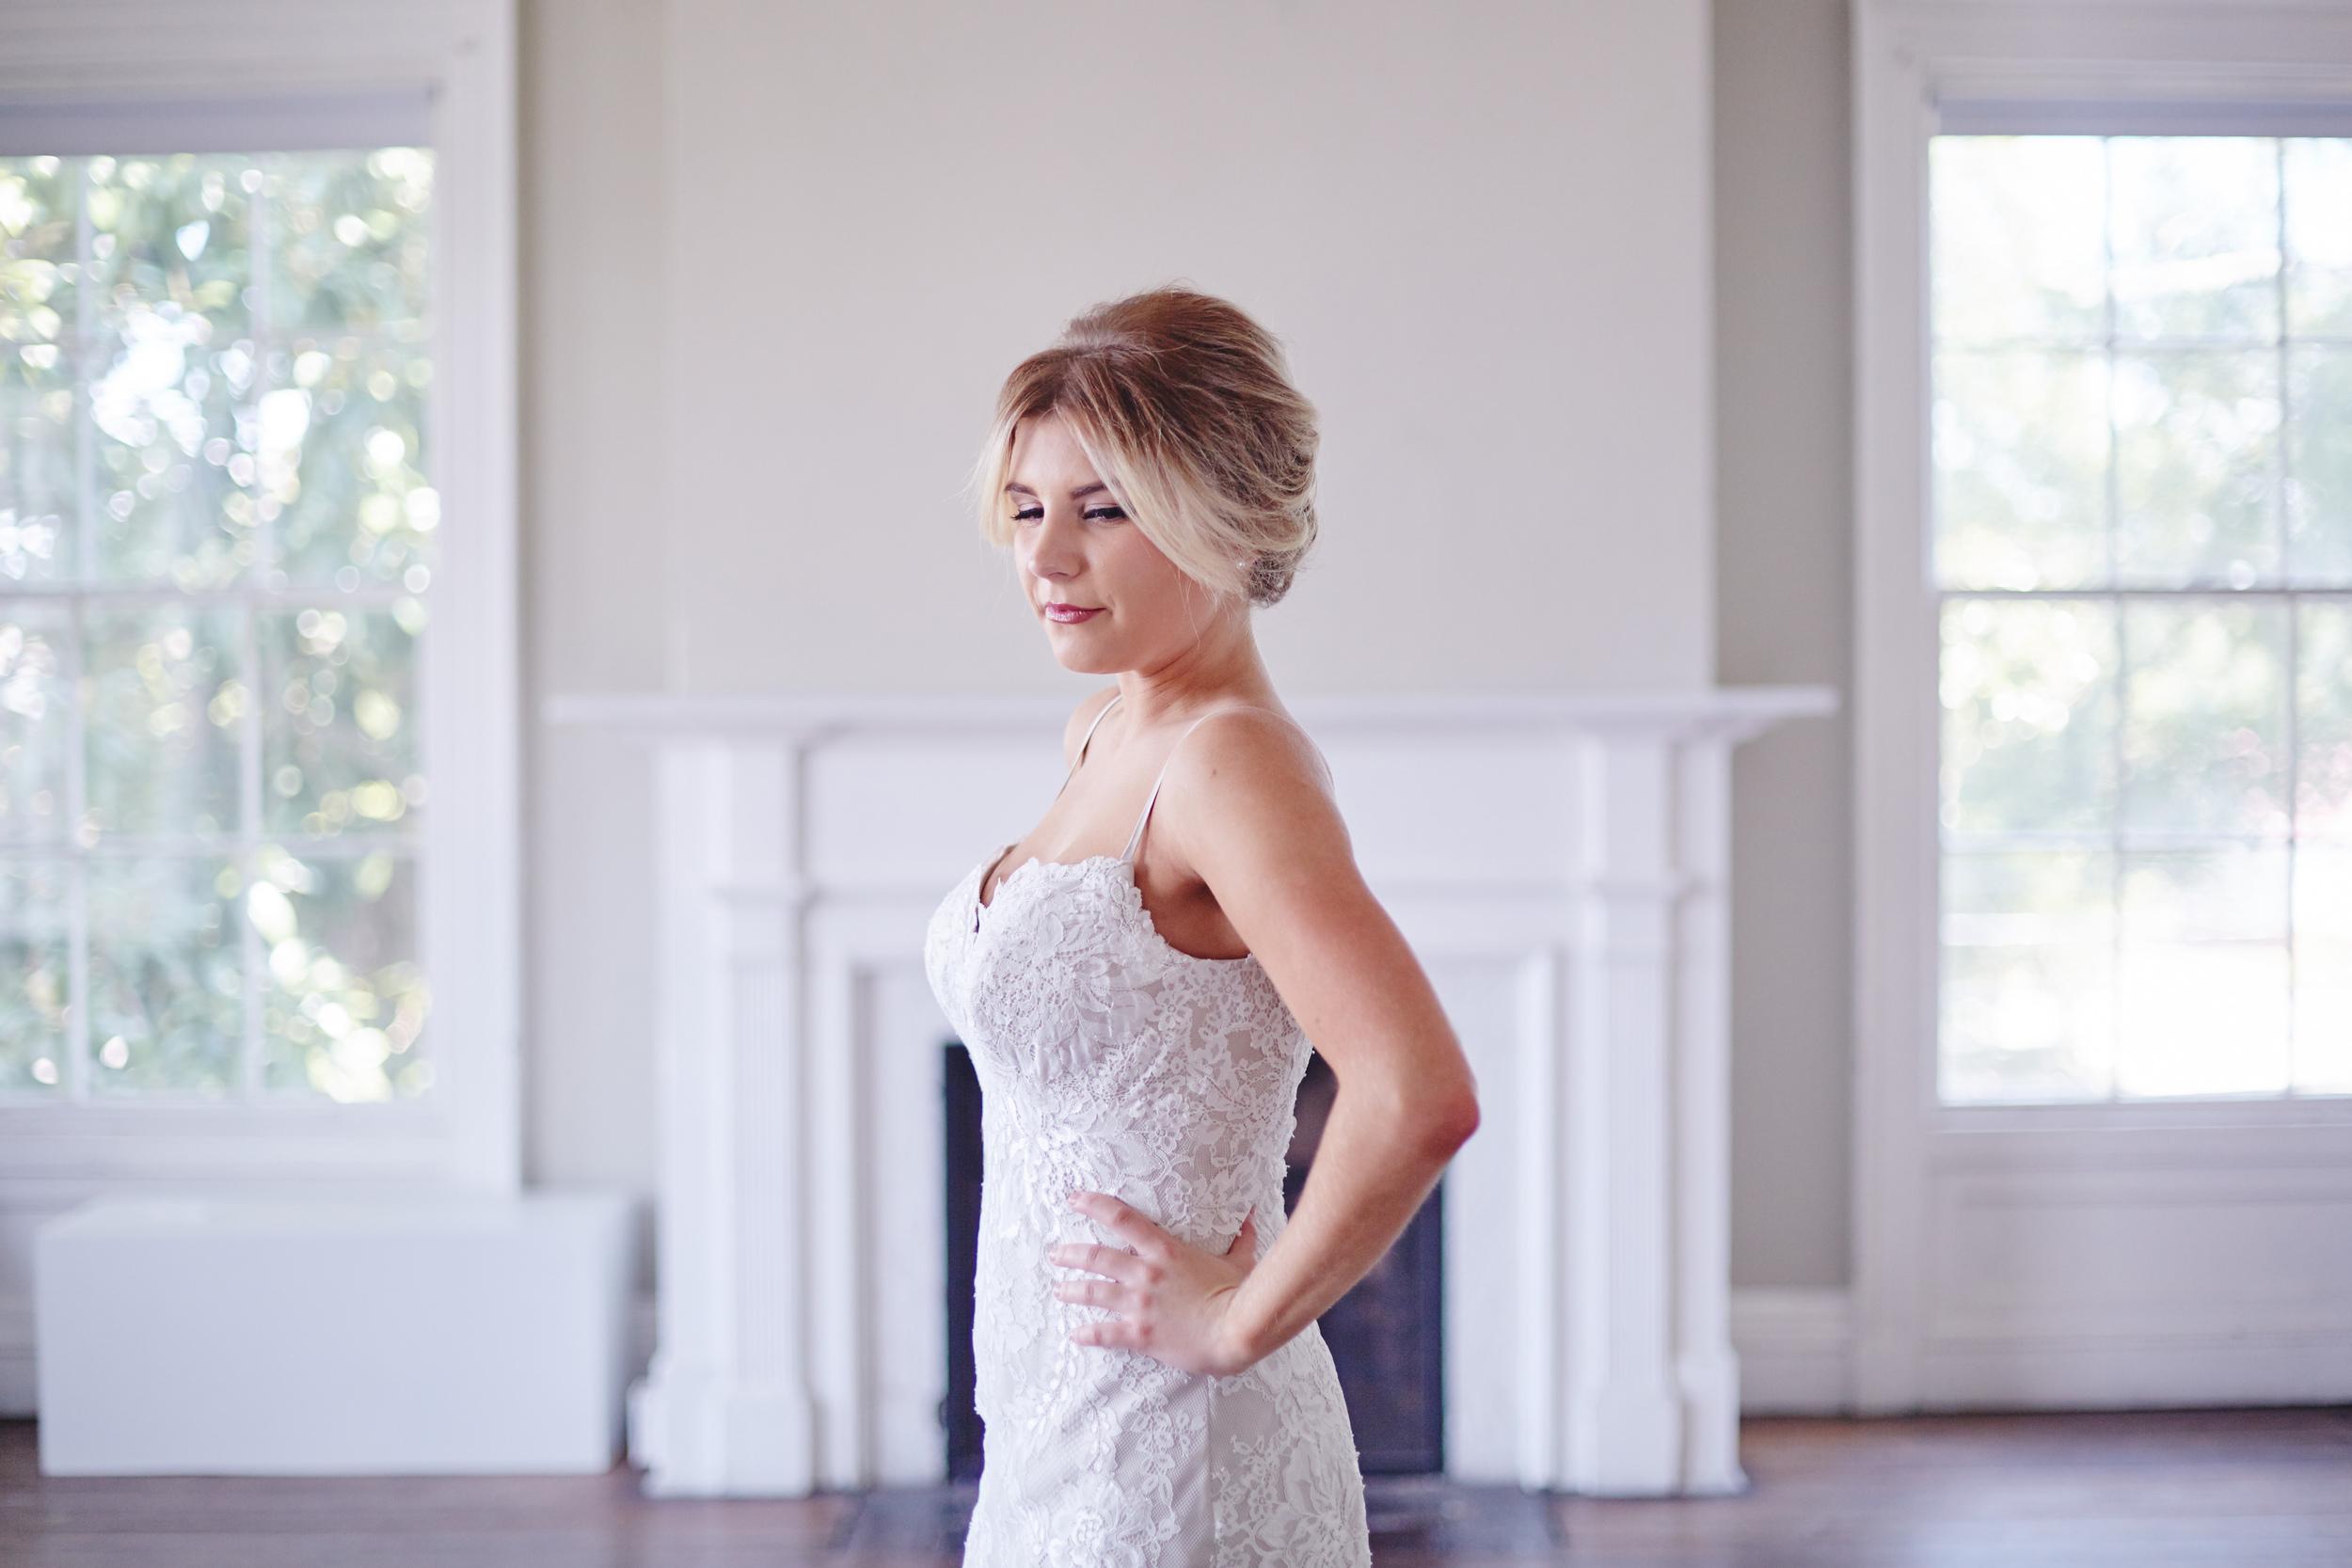 Styled_Session_Becca_Bridal_Portraits_Sarah_Tau_Photography_HOB_Studio_285 42.jpg